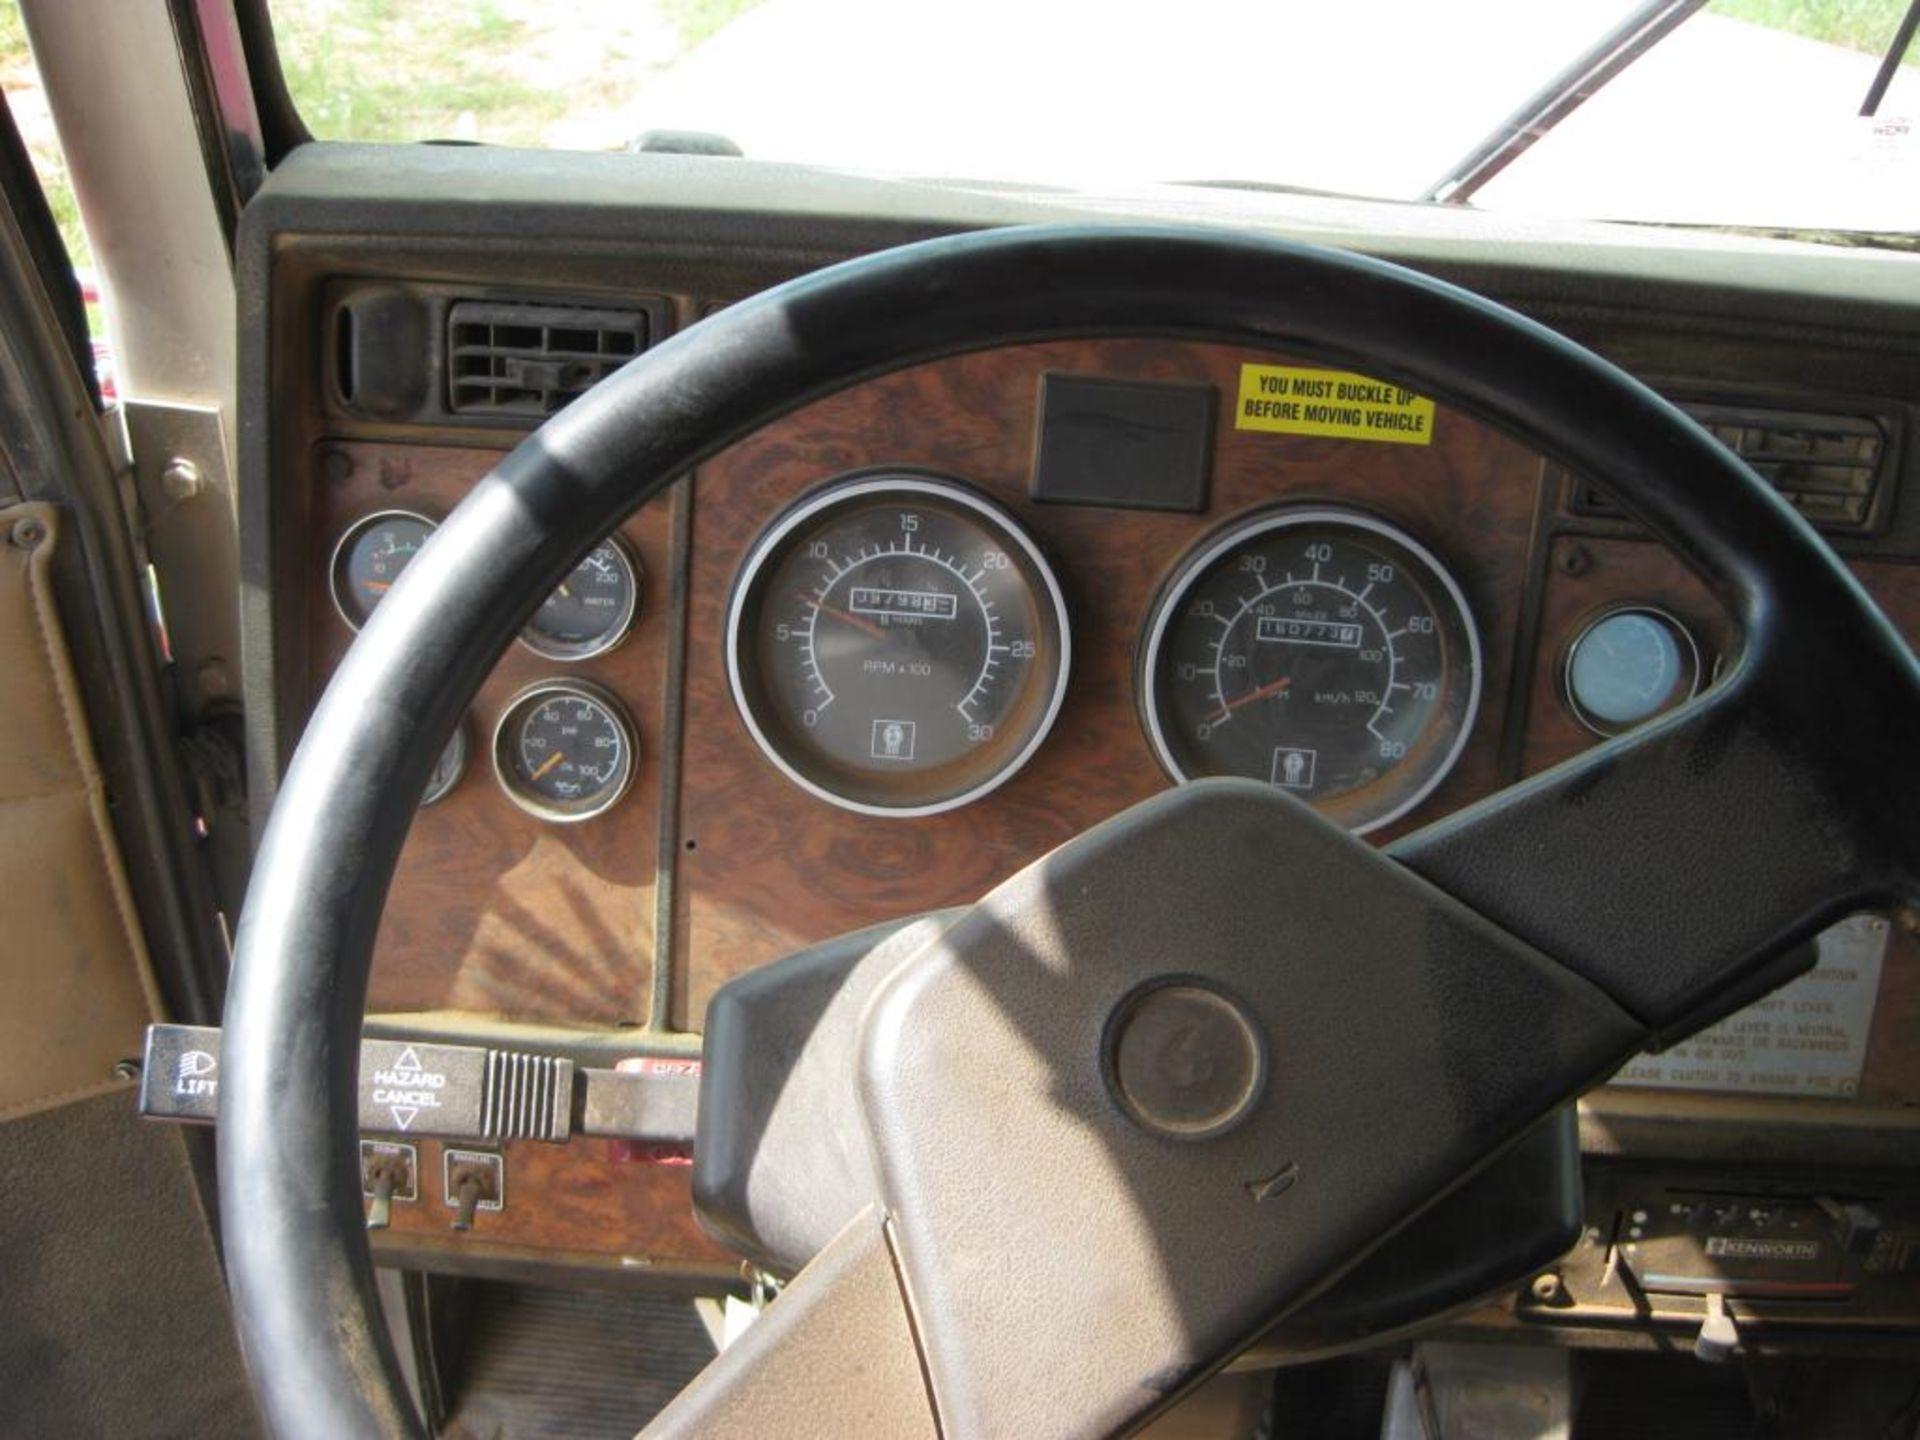 Kenworth Winch Truck - Image 17 of 23